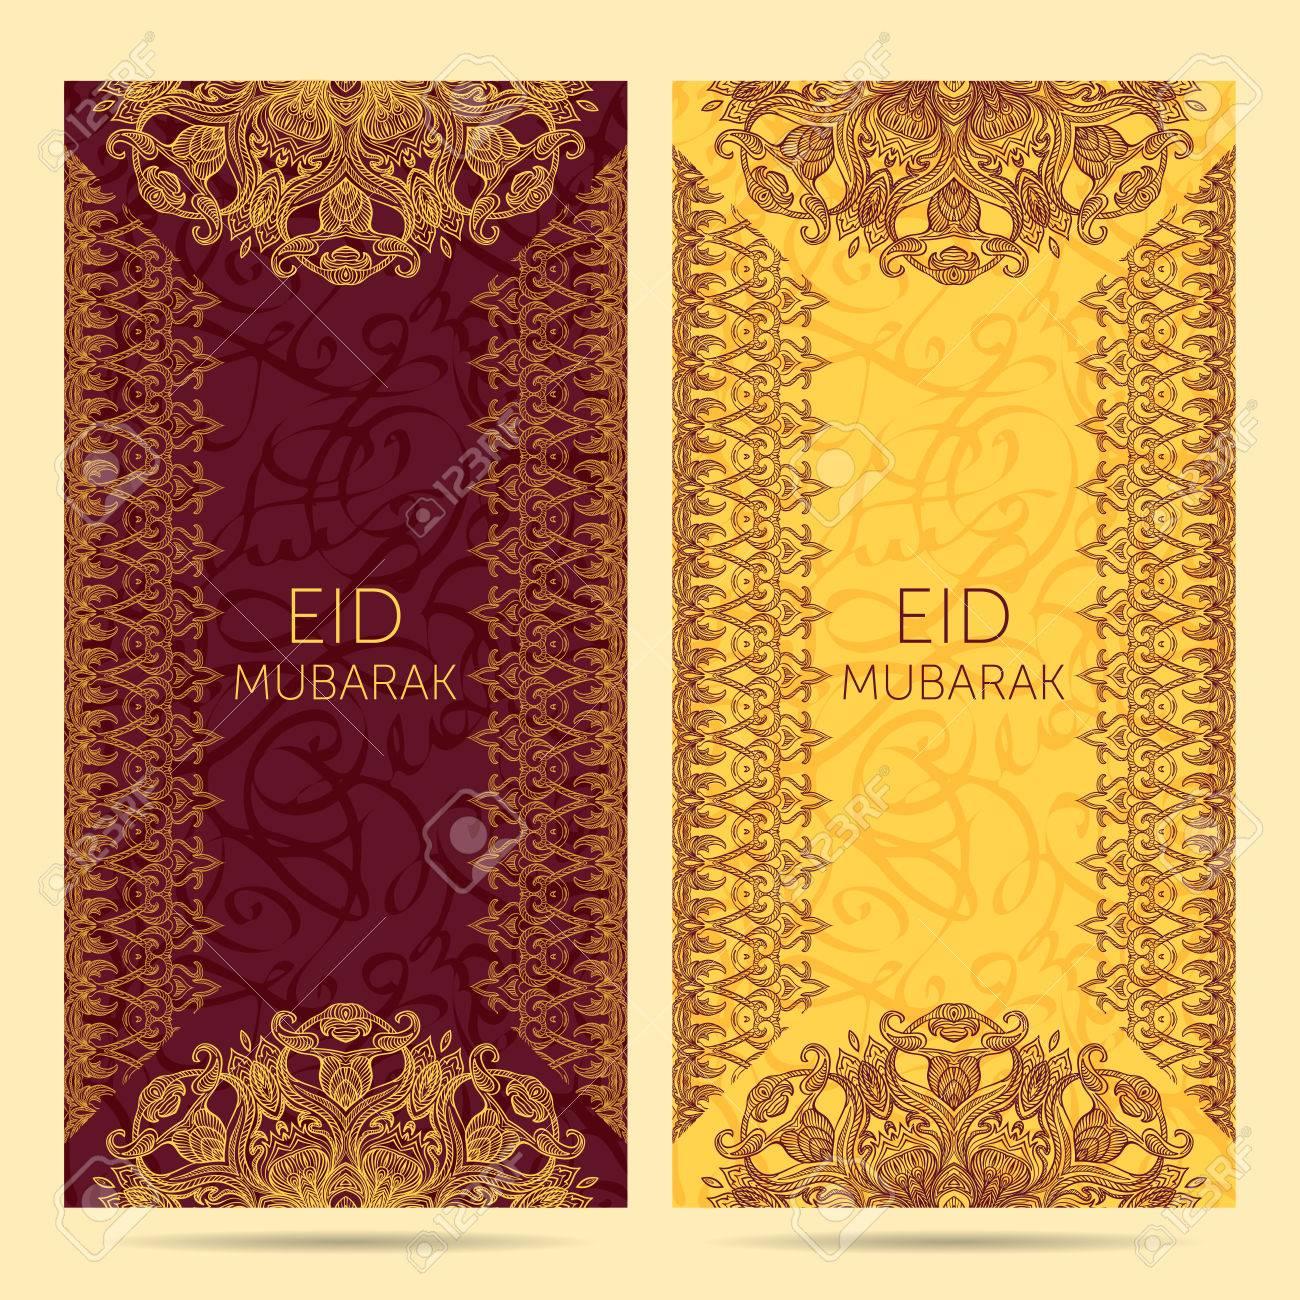 Beautiful greeting card for muslim community festival eid mubarak beautiful greeting card for muslim community festival eid mubarak pattern with ornament arabic calligraphy m4hsunfo